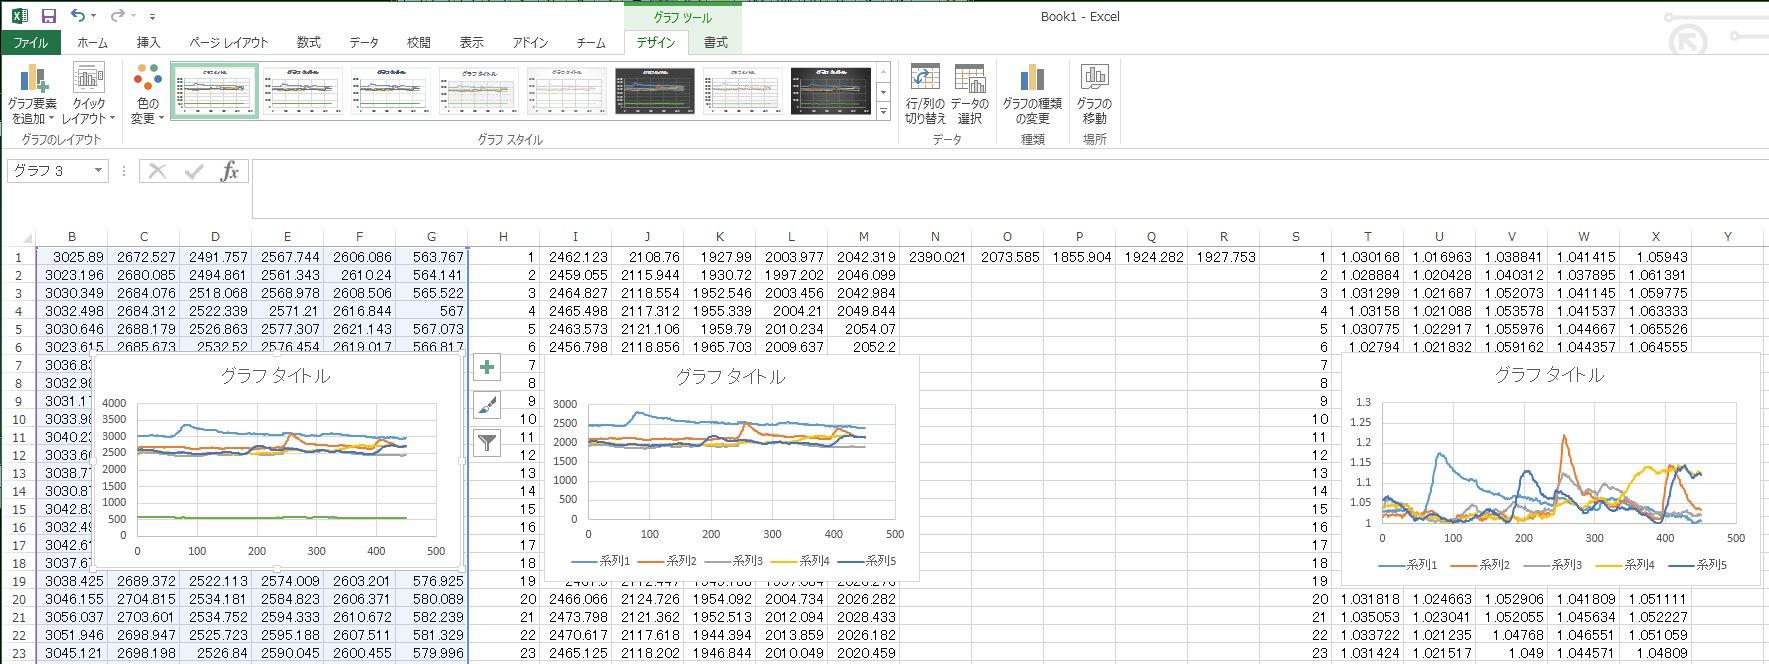 ExcelGraphs